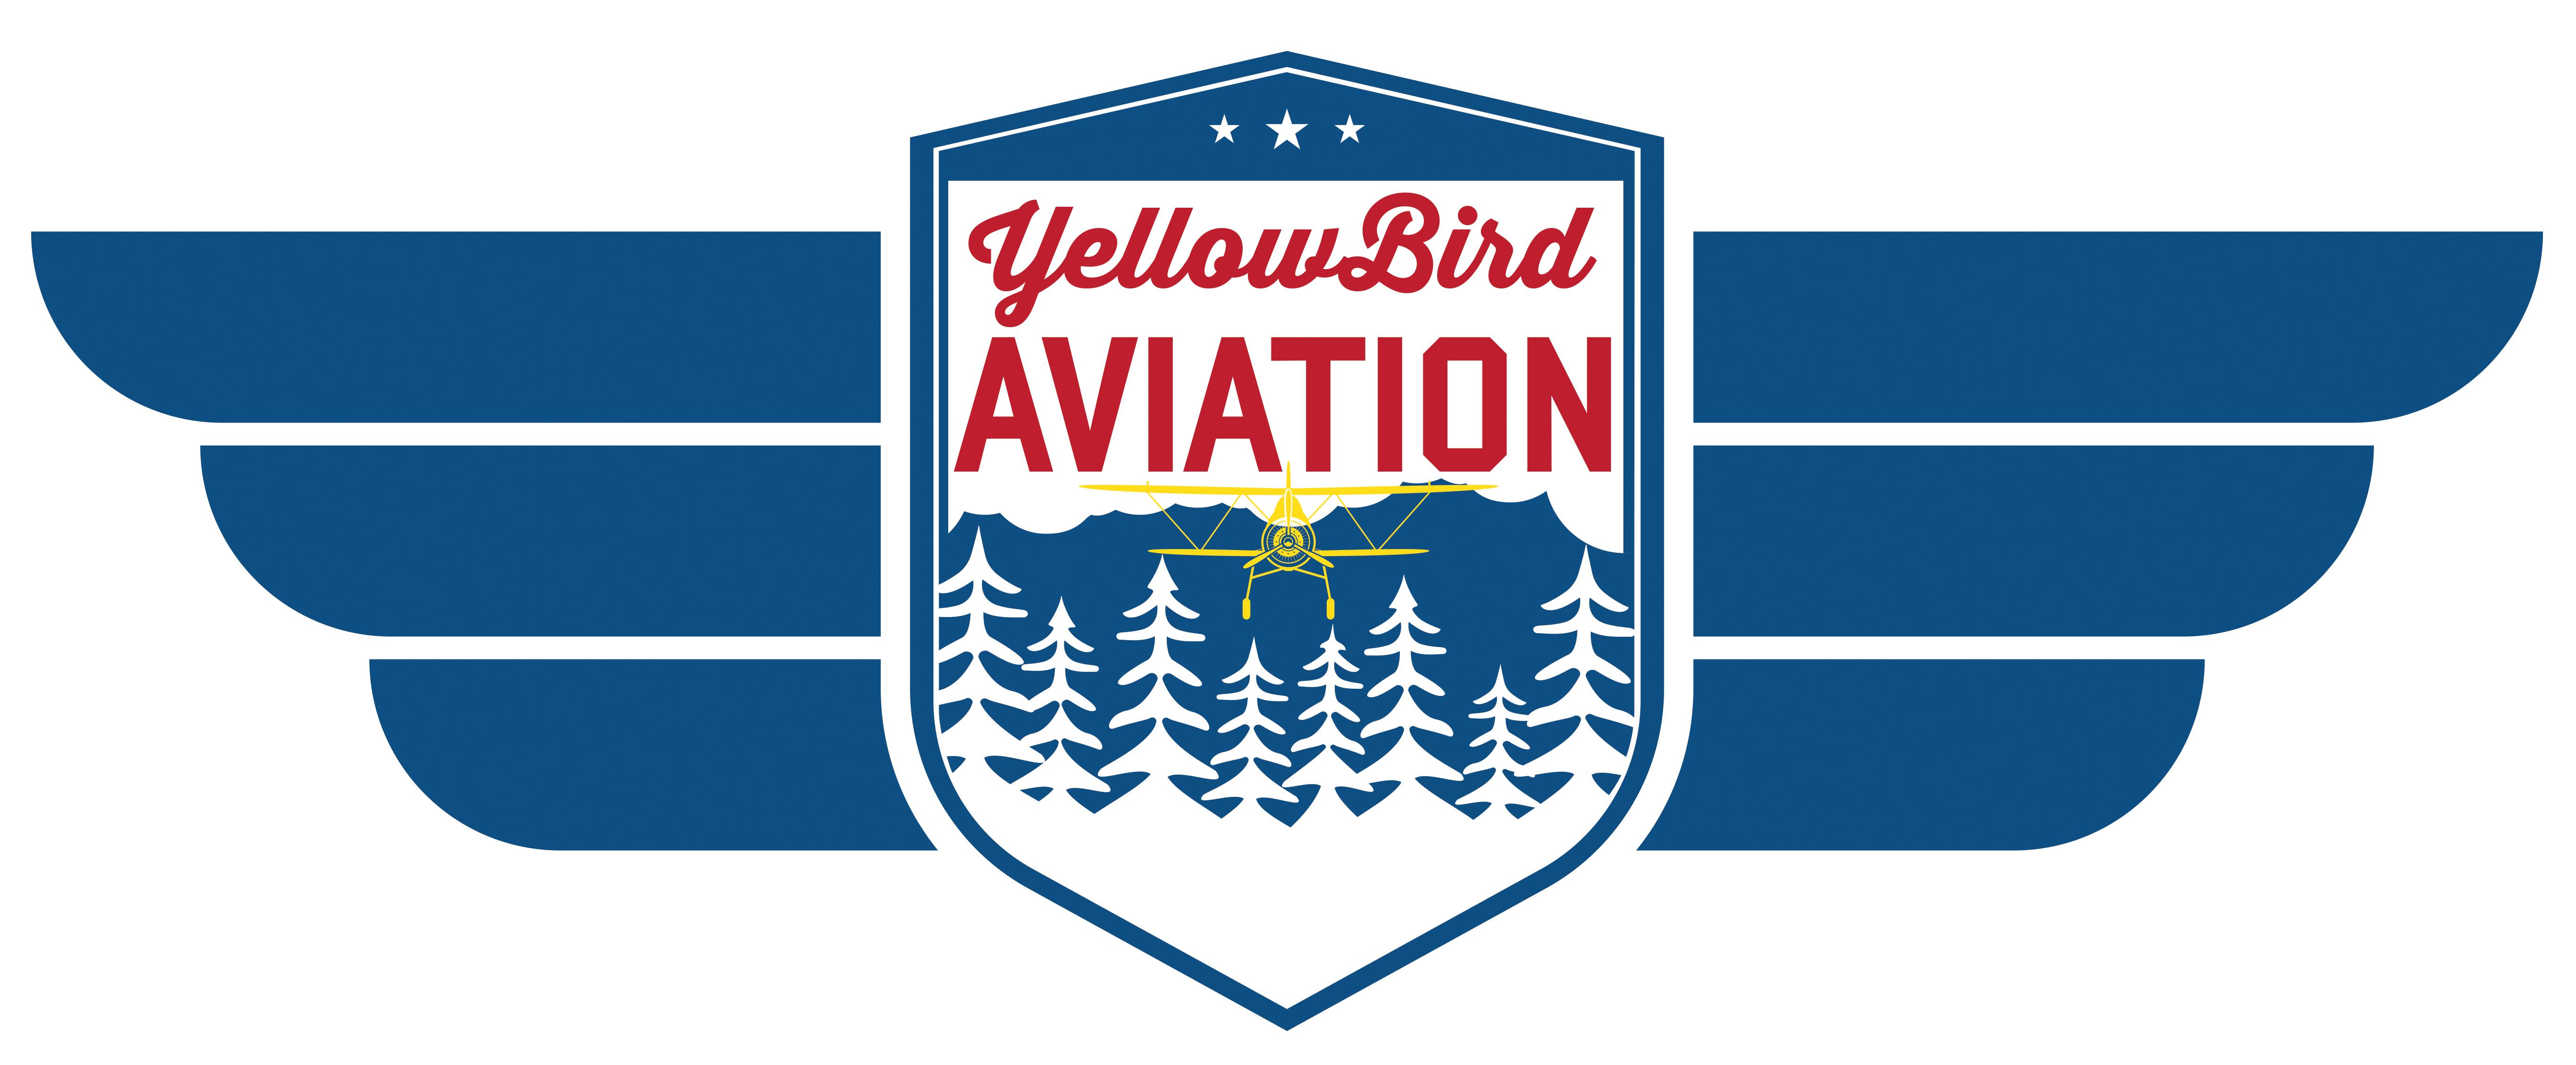 Yellowbird Aviation